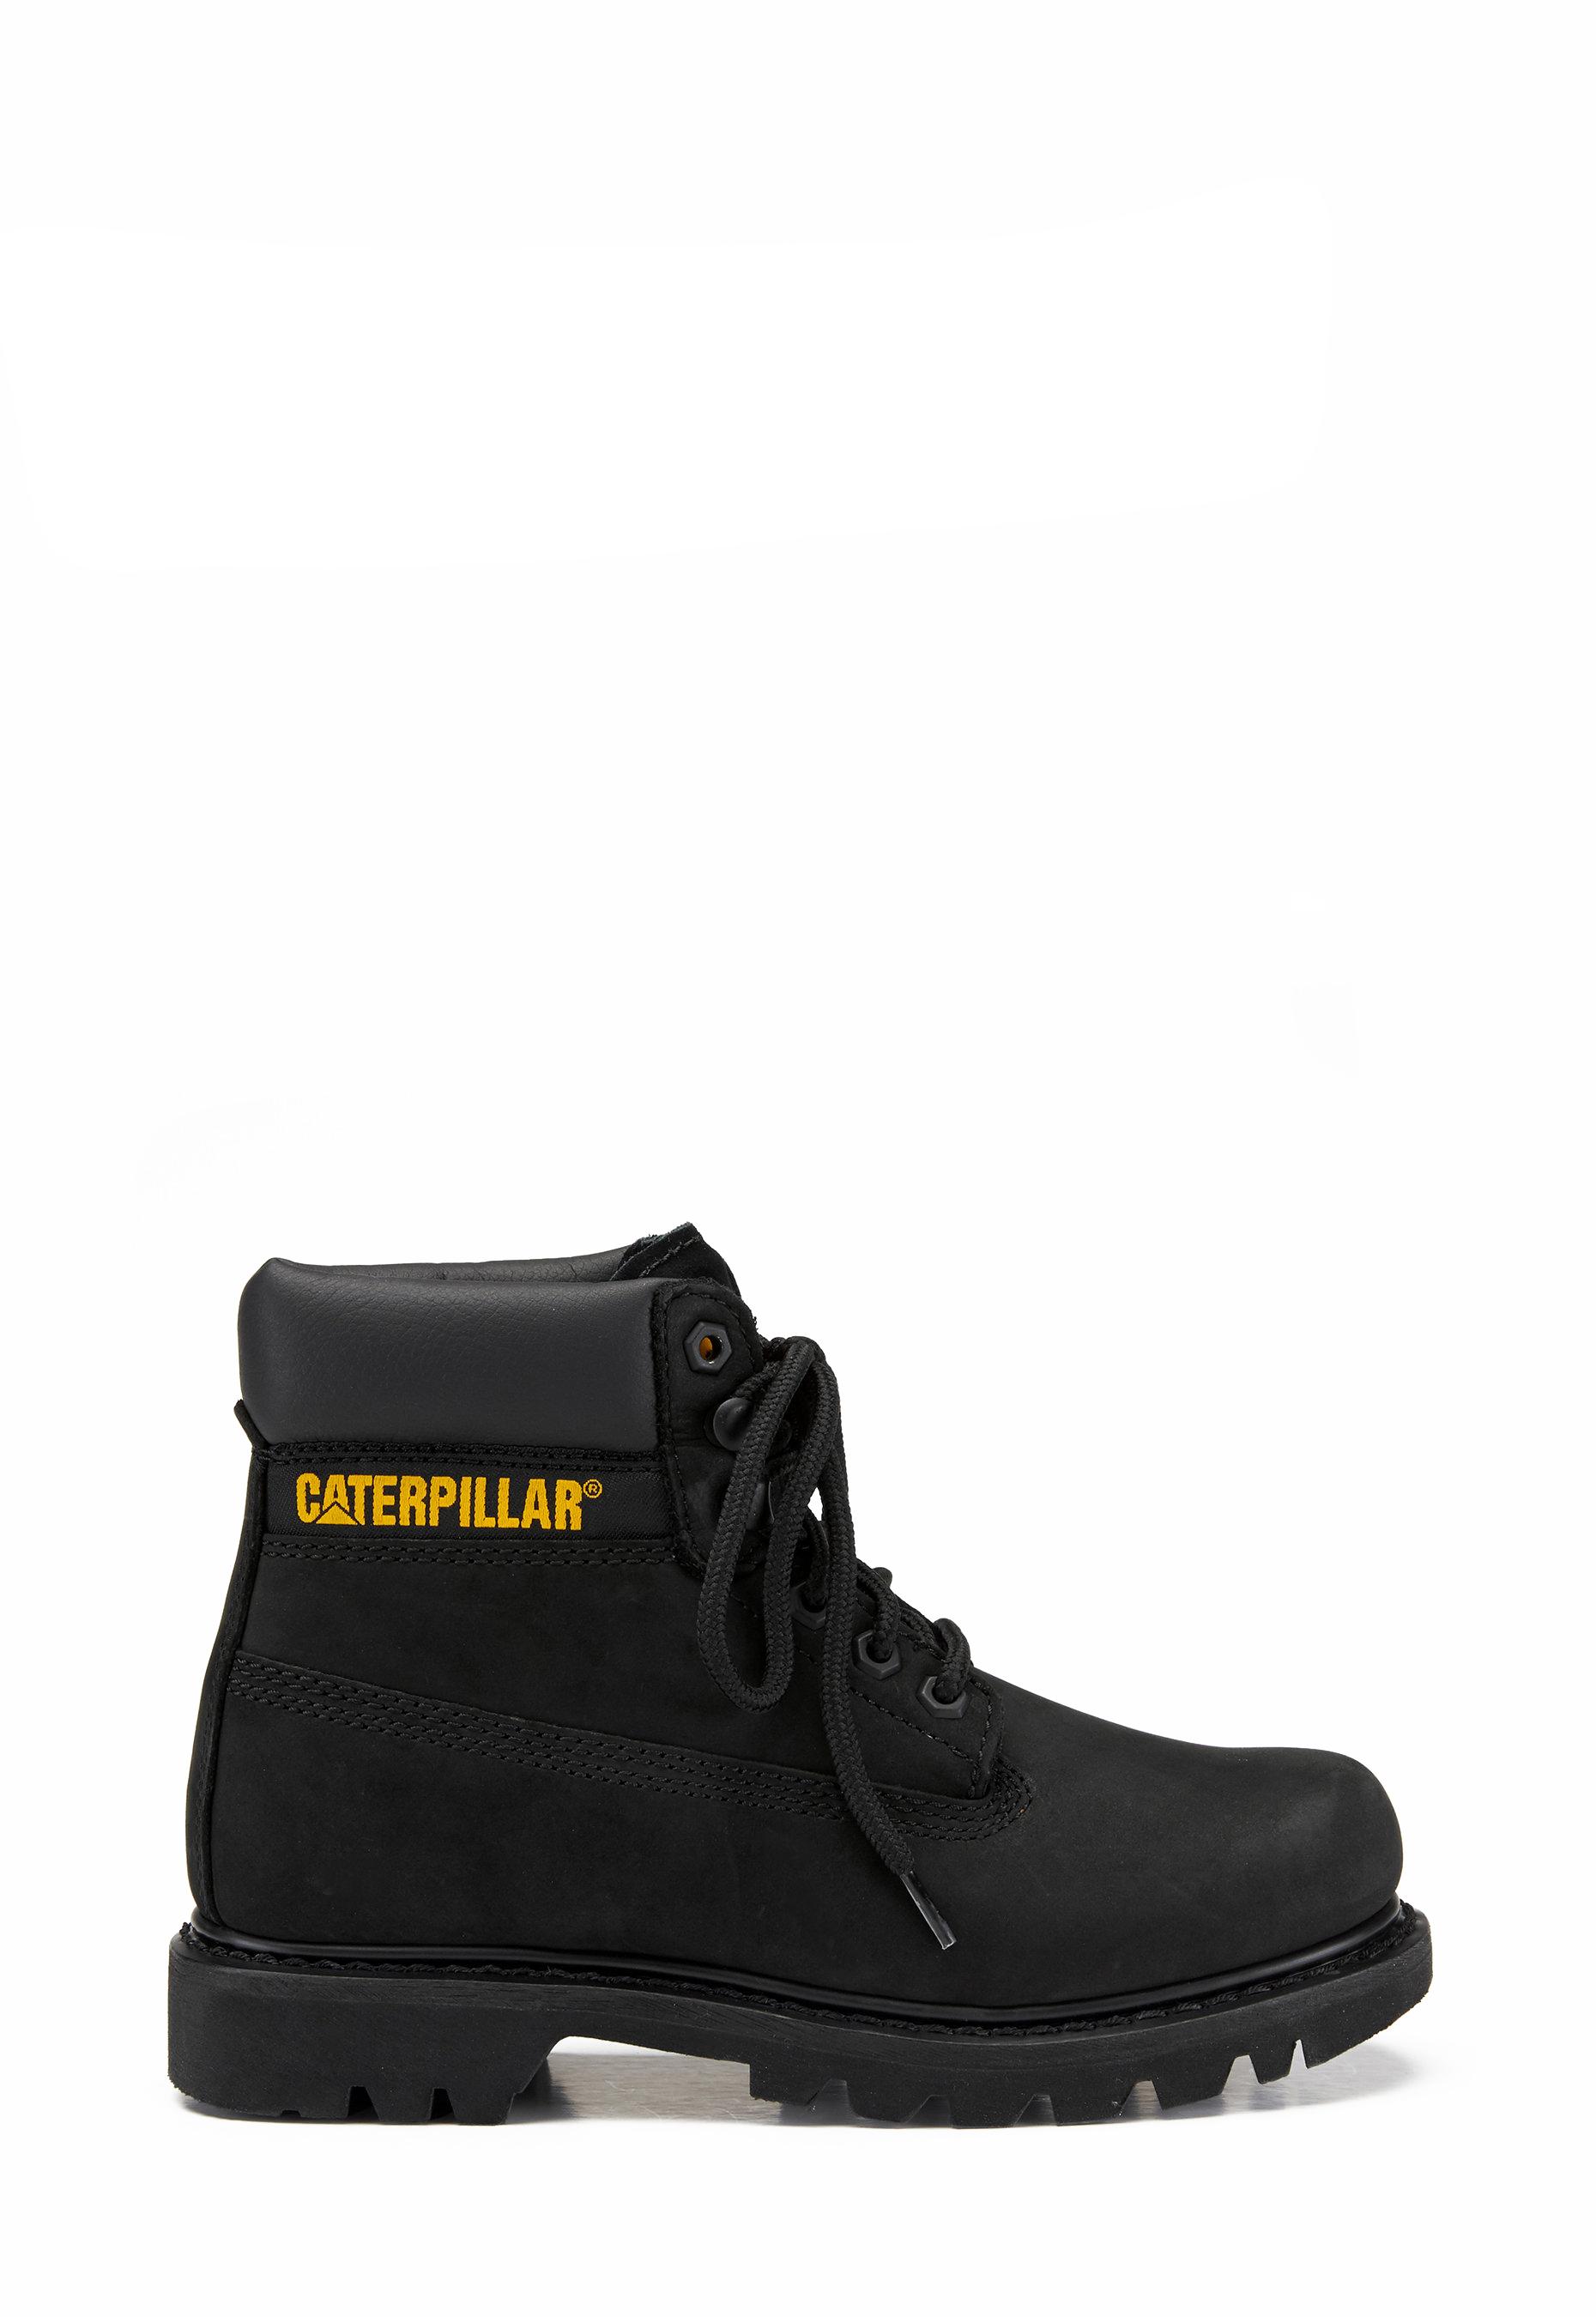 0726077d098 Caterpillar Colorado Boot Black - Bubbleroom